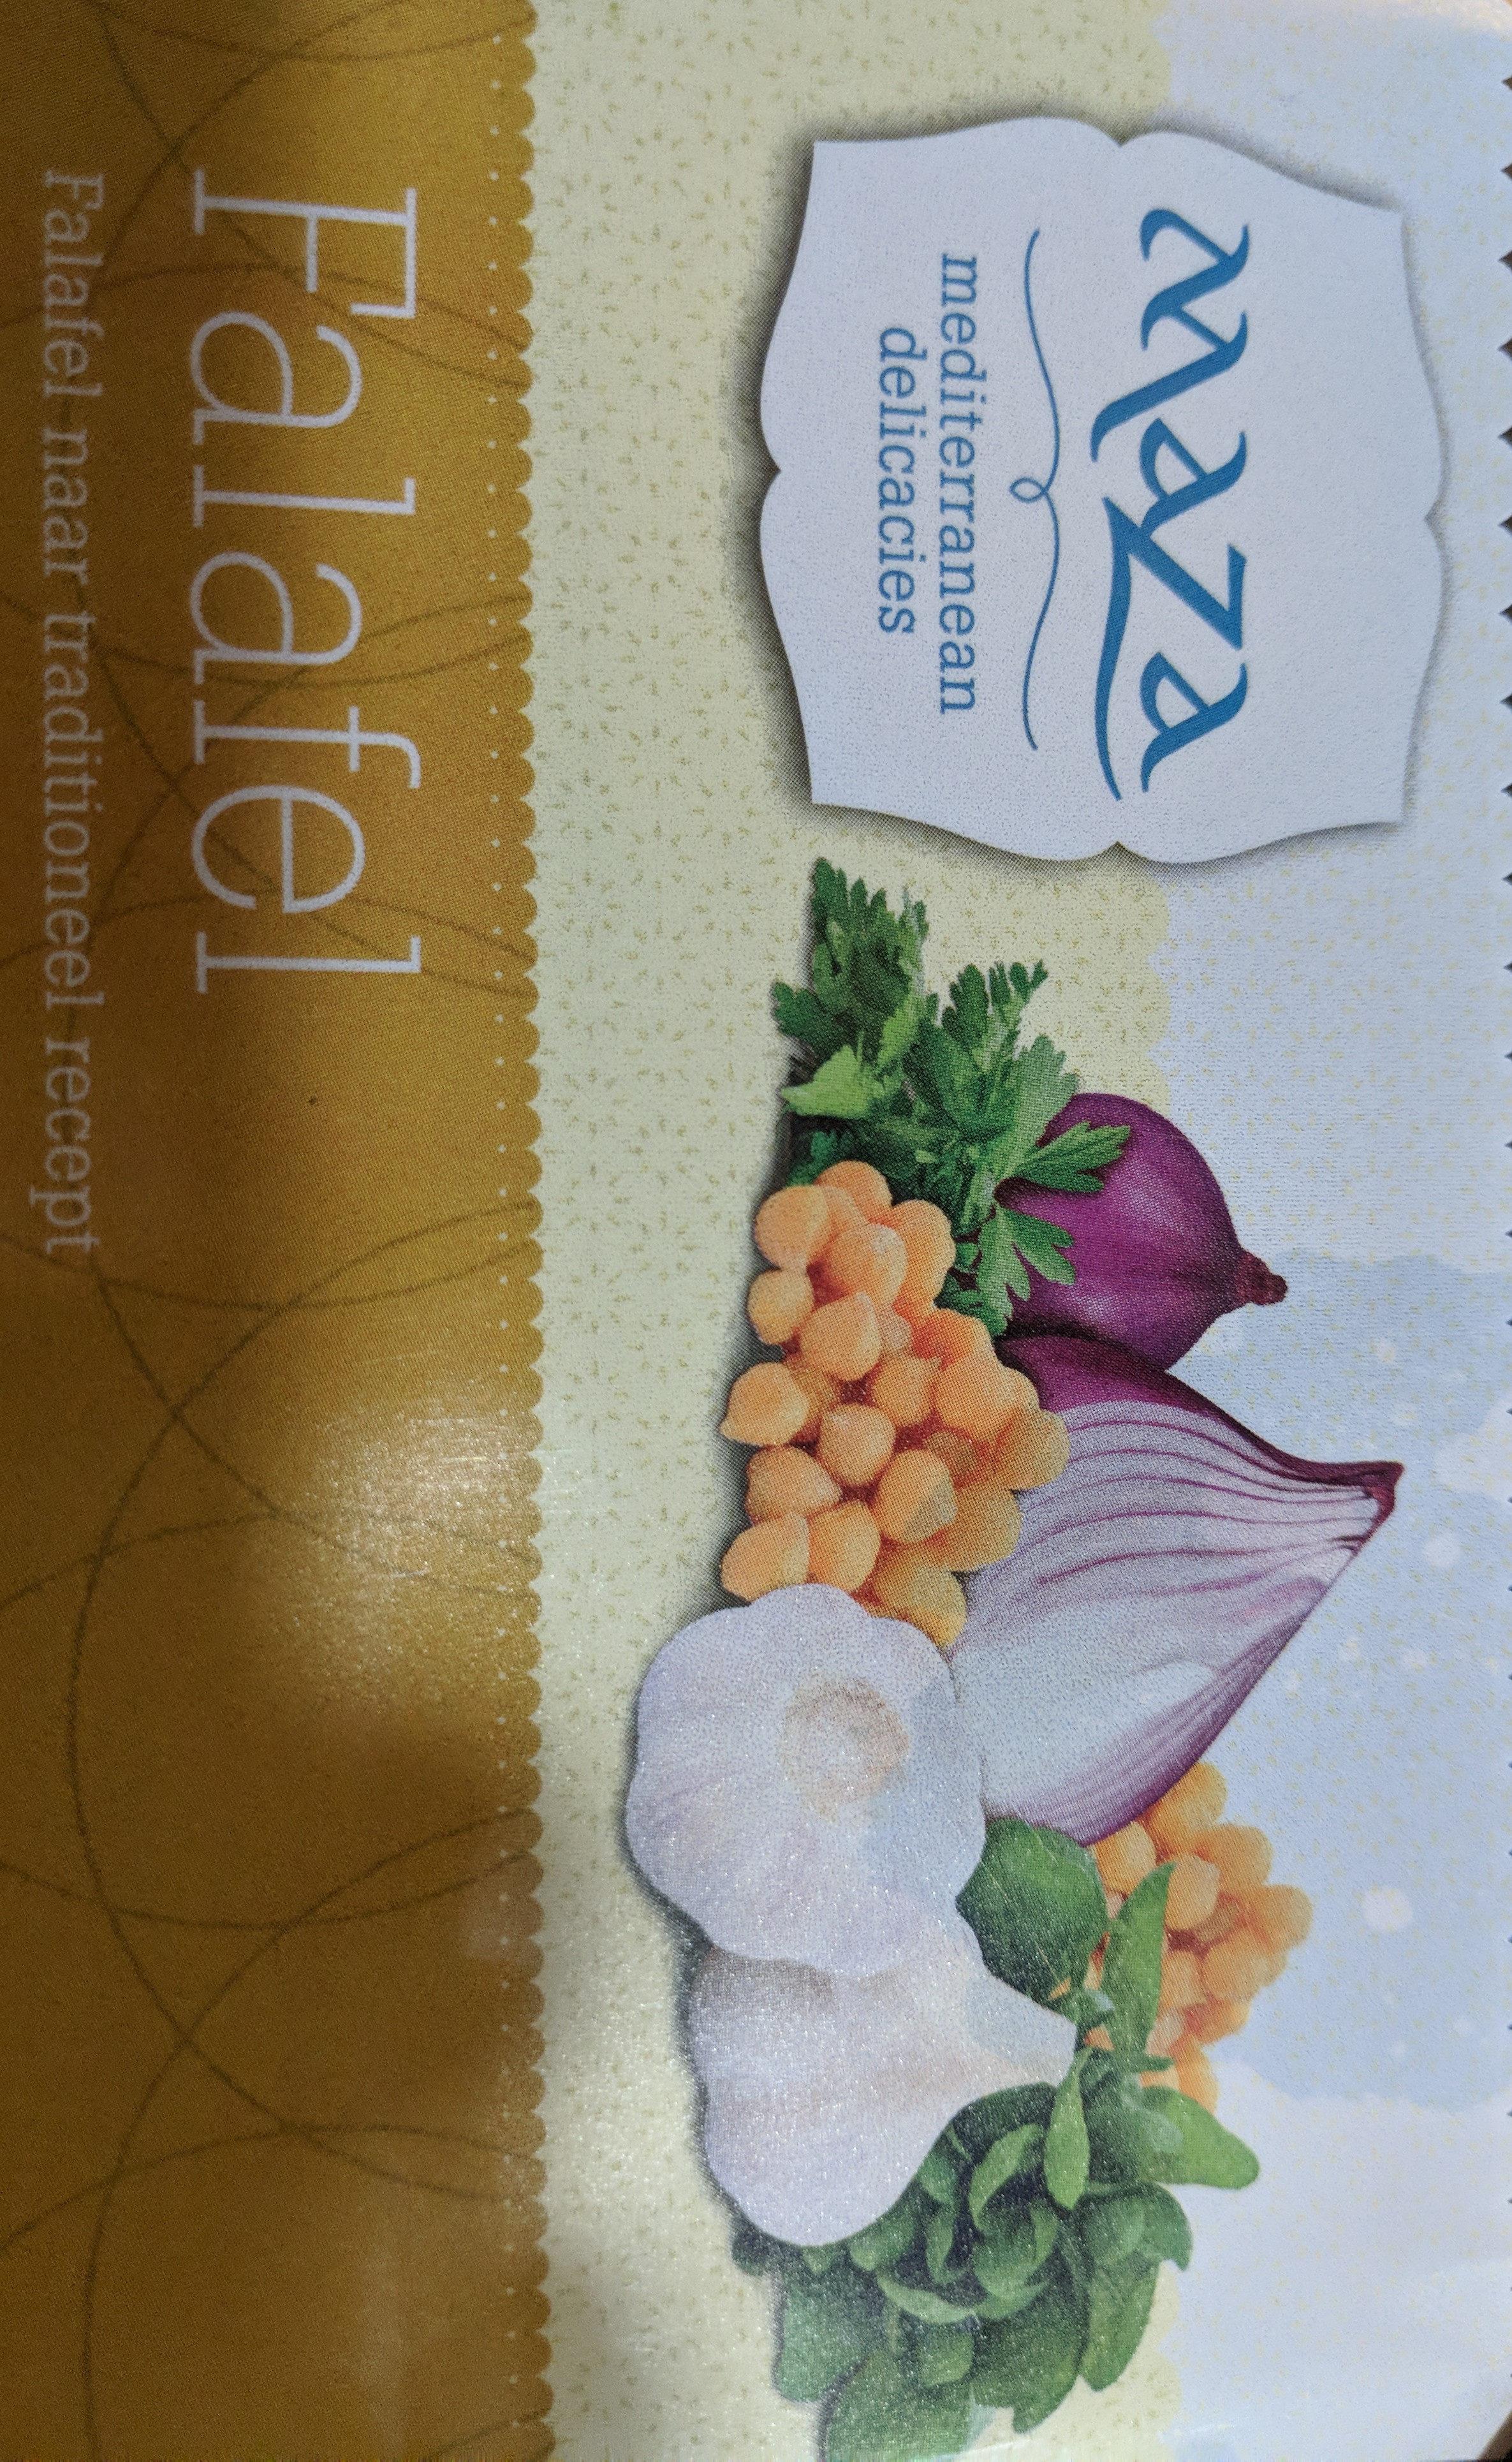 Falafel - Product - nl